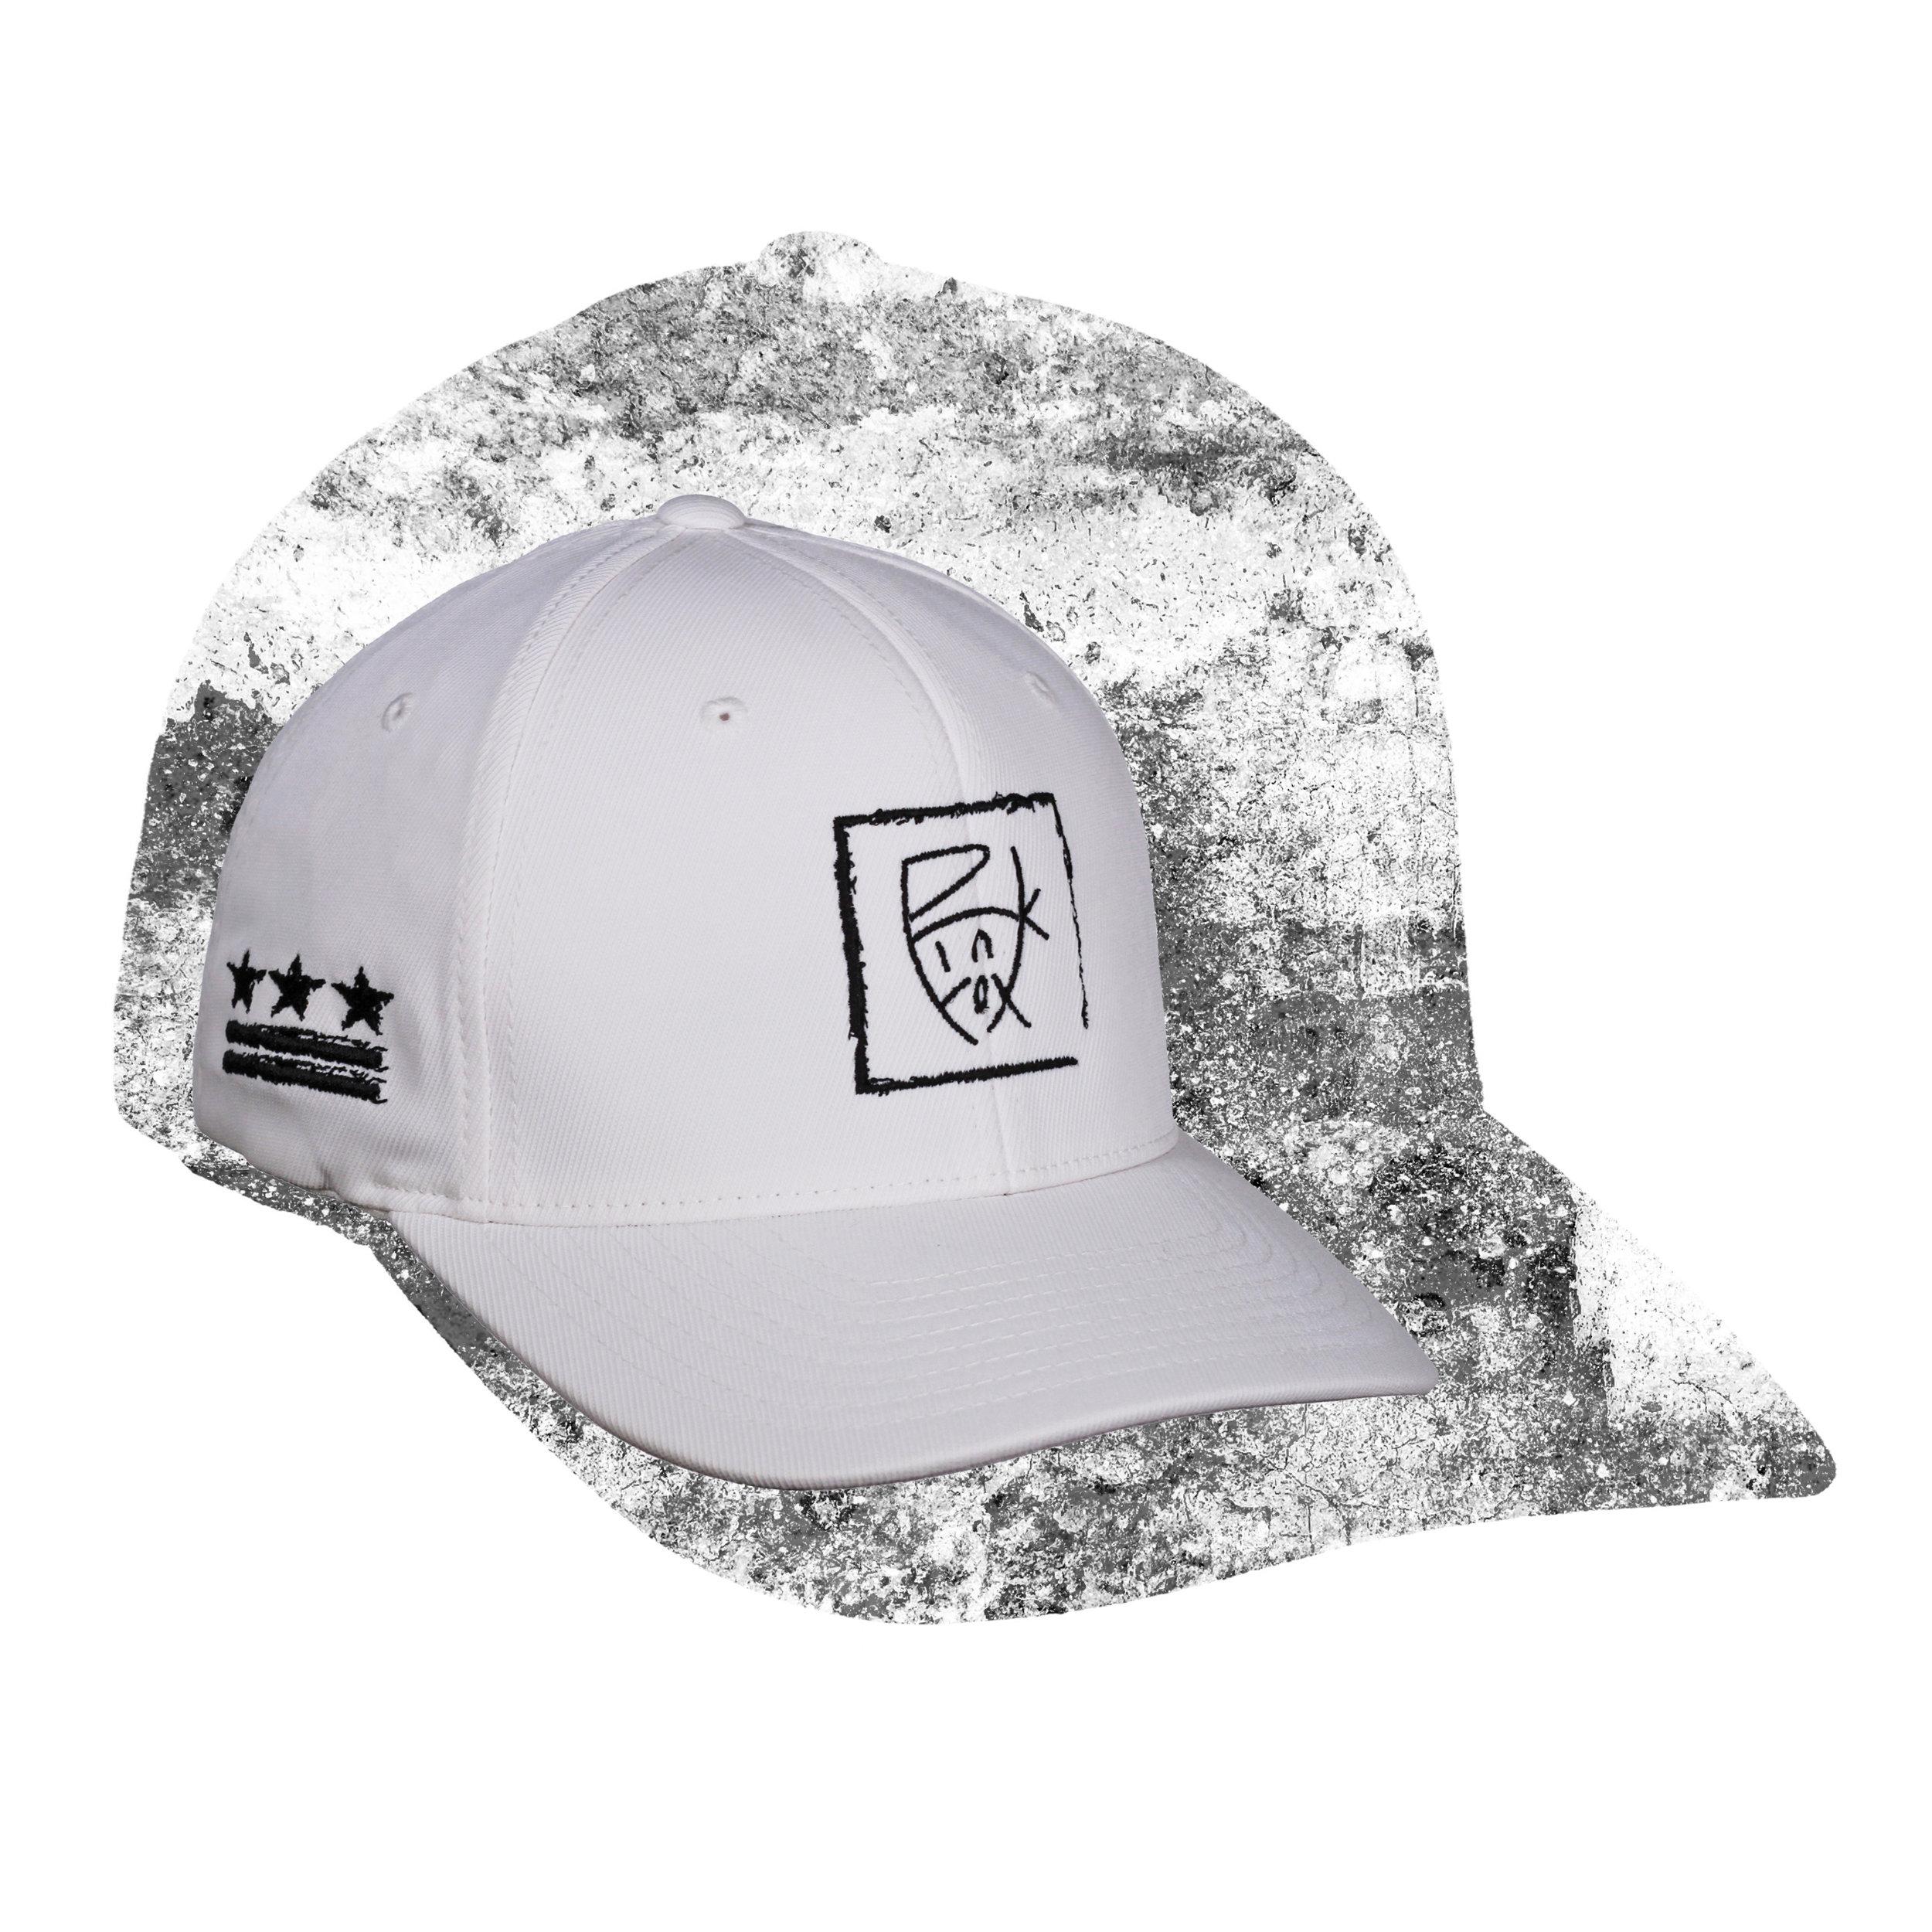 White hat v2 4.jpg